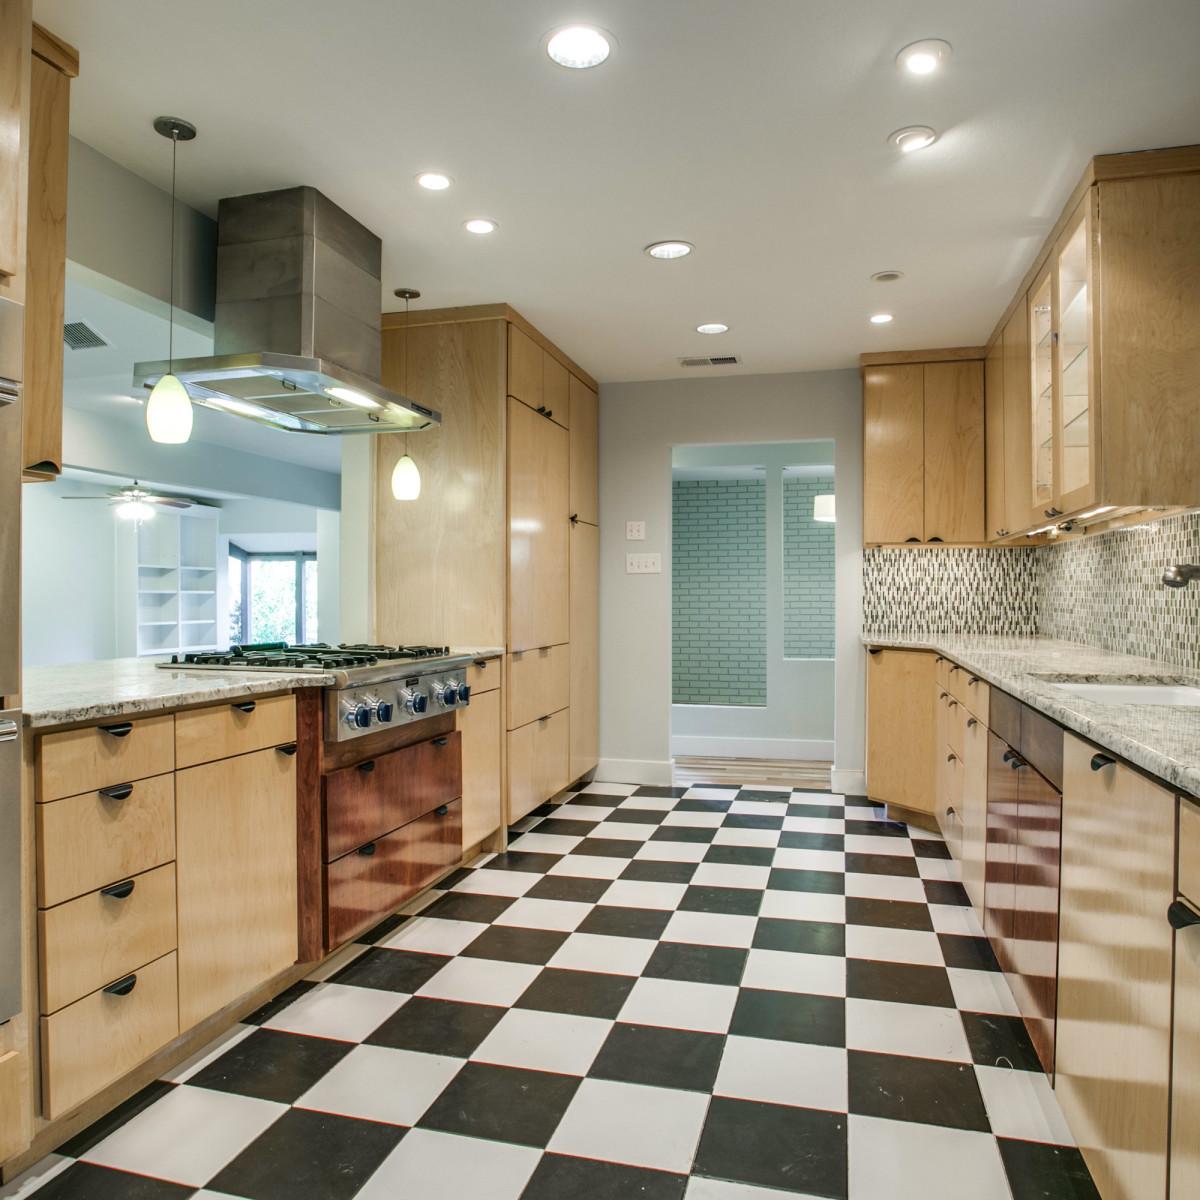 Kitchen at 3820 Shorecrest Dr. in Dallas